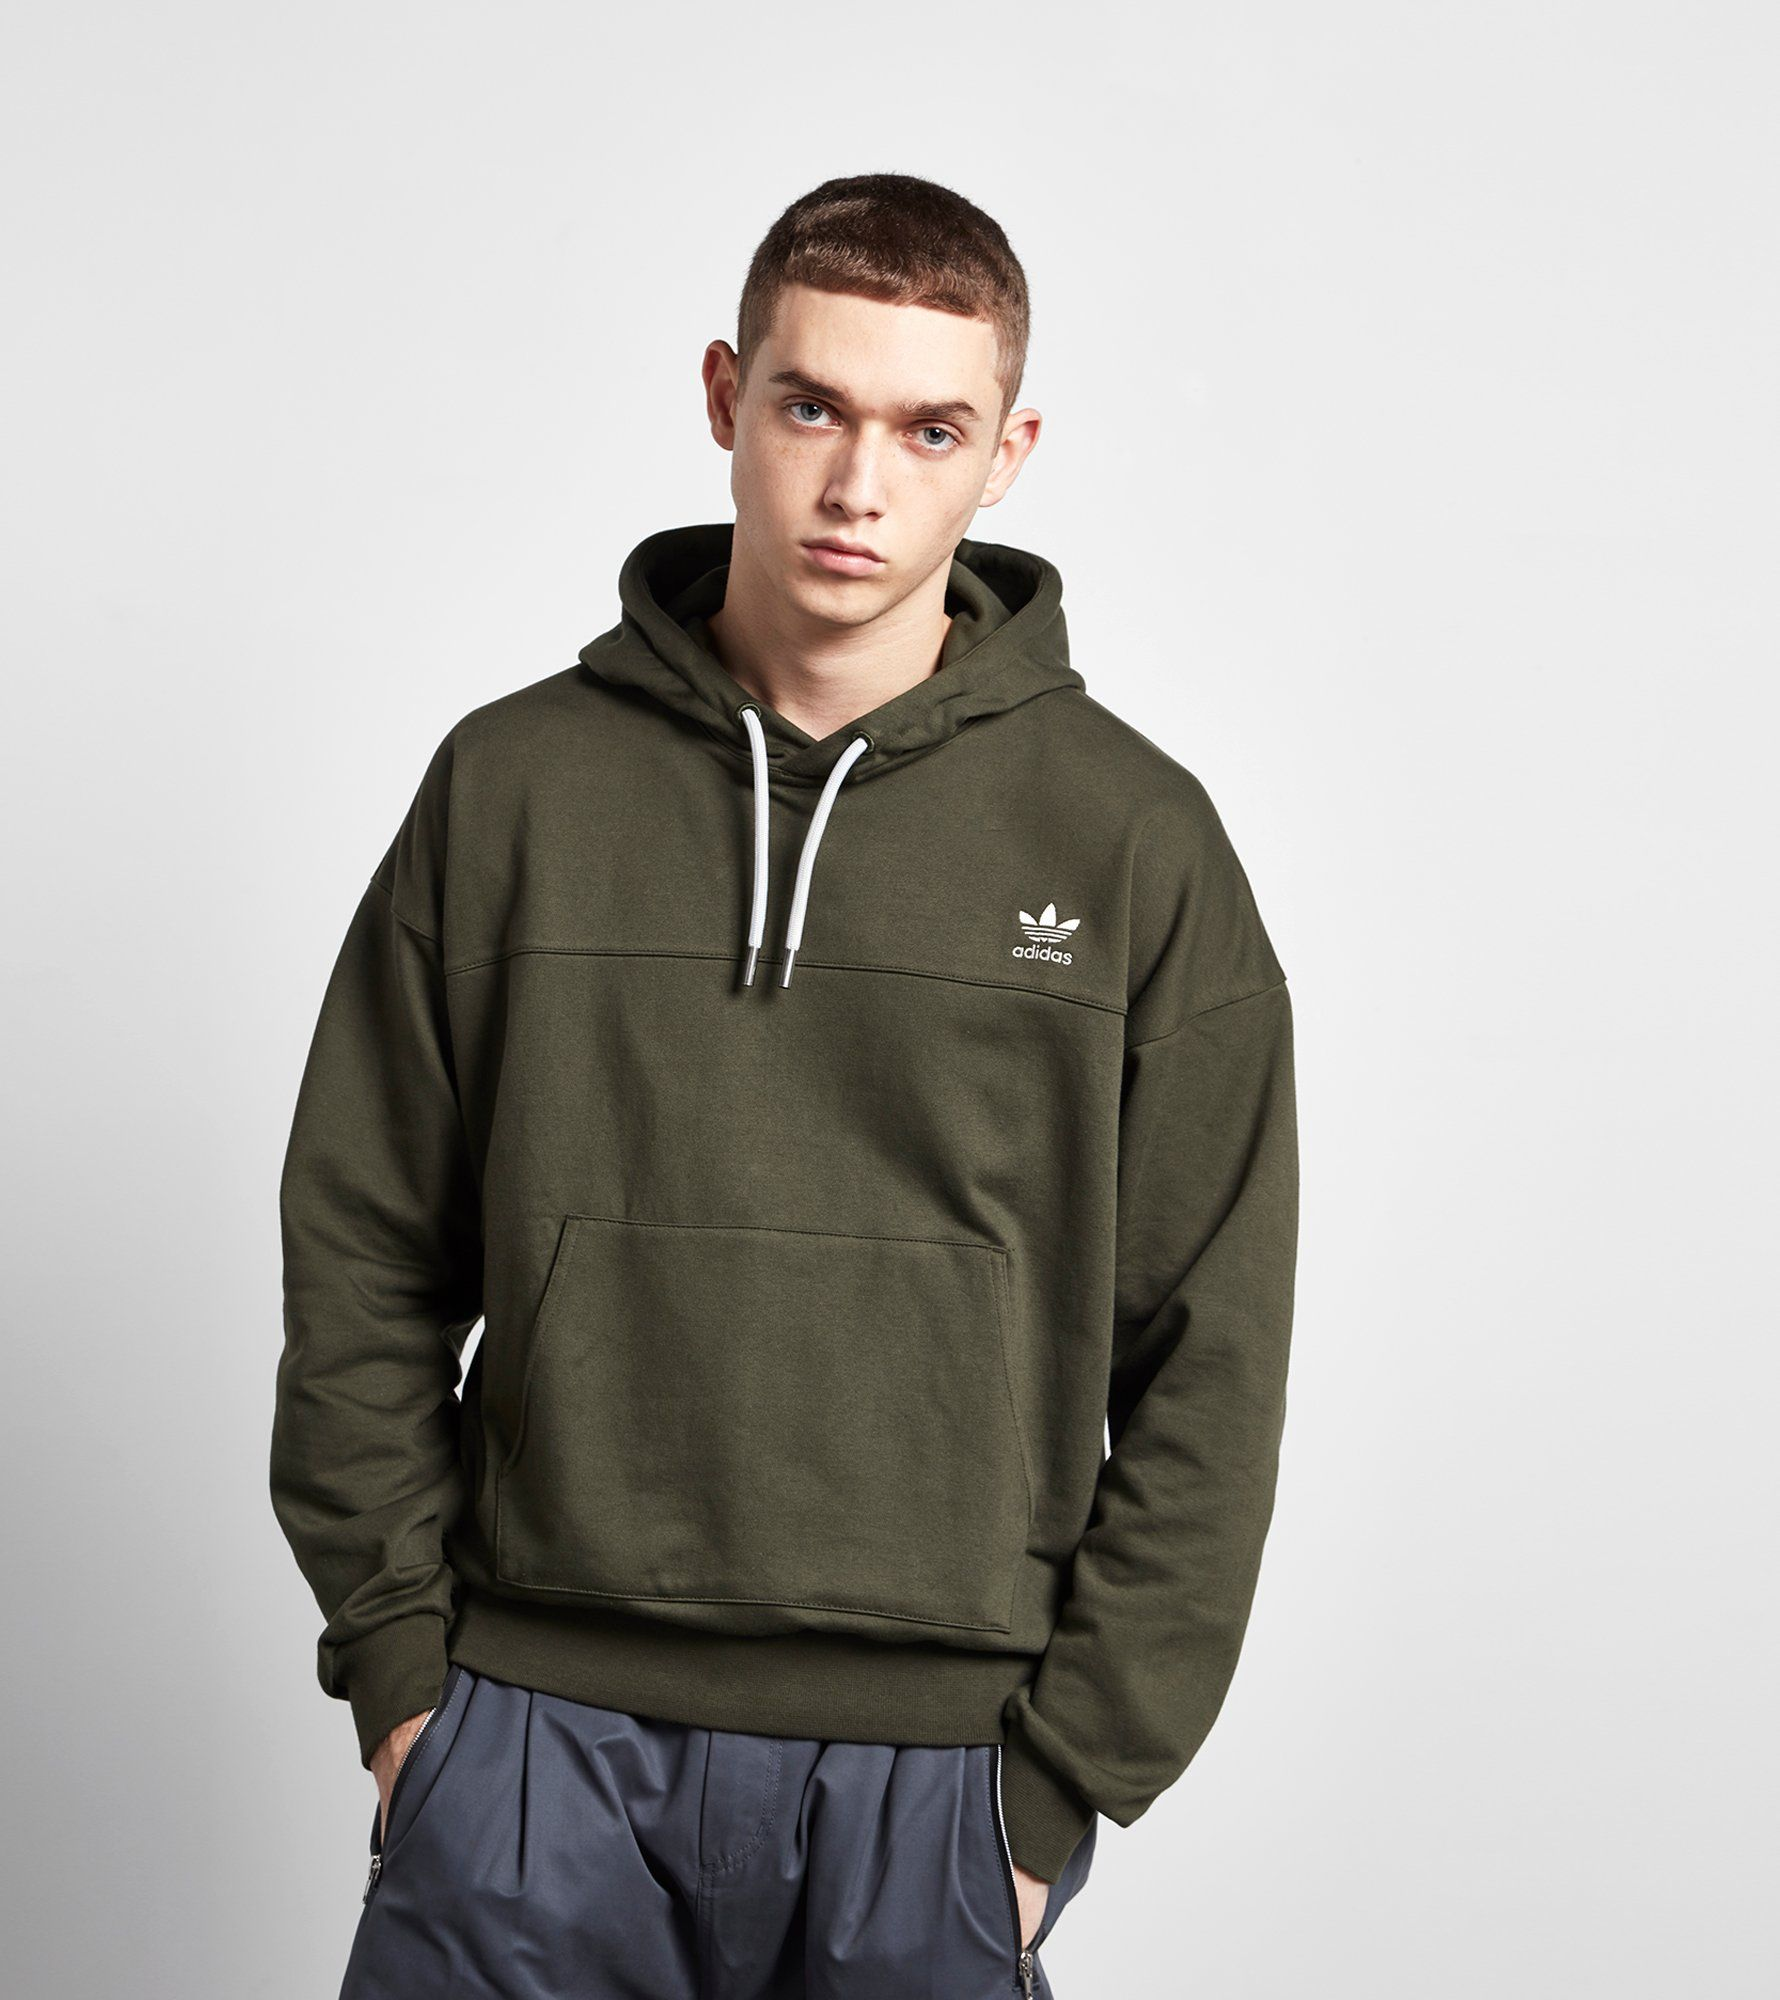 Adidas Originals Fallen Future Hoody Size